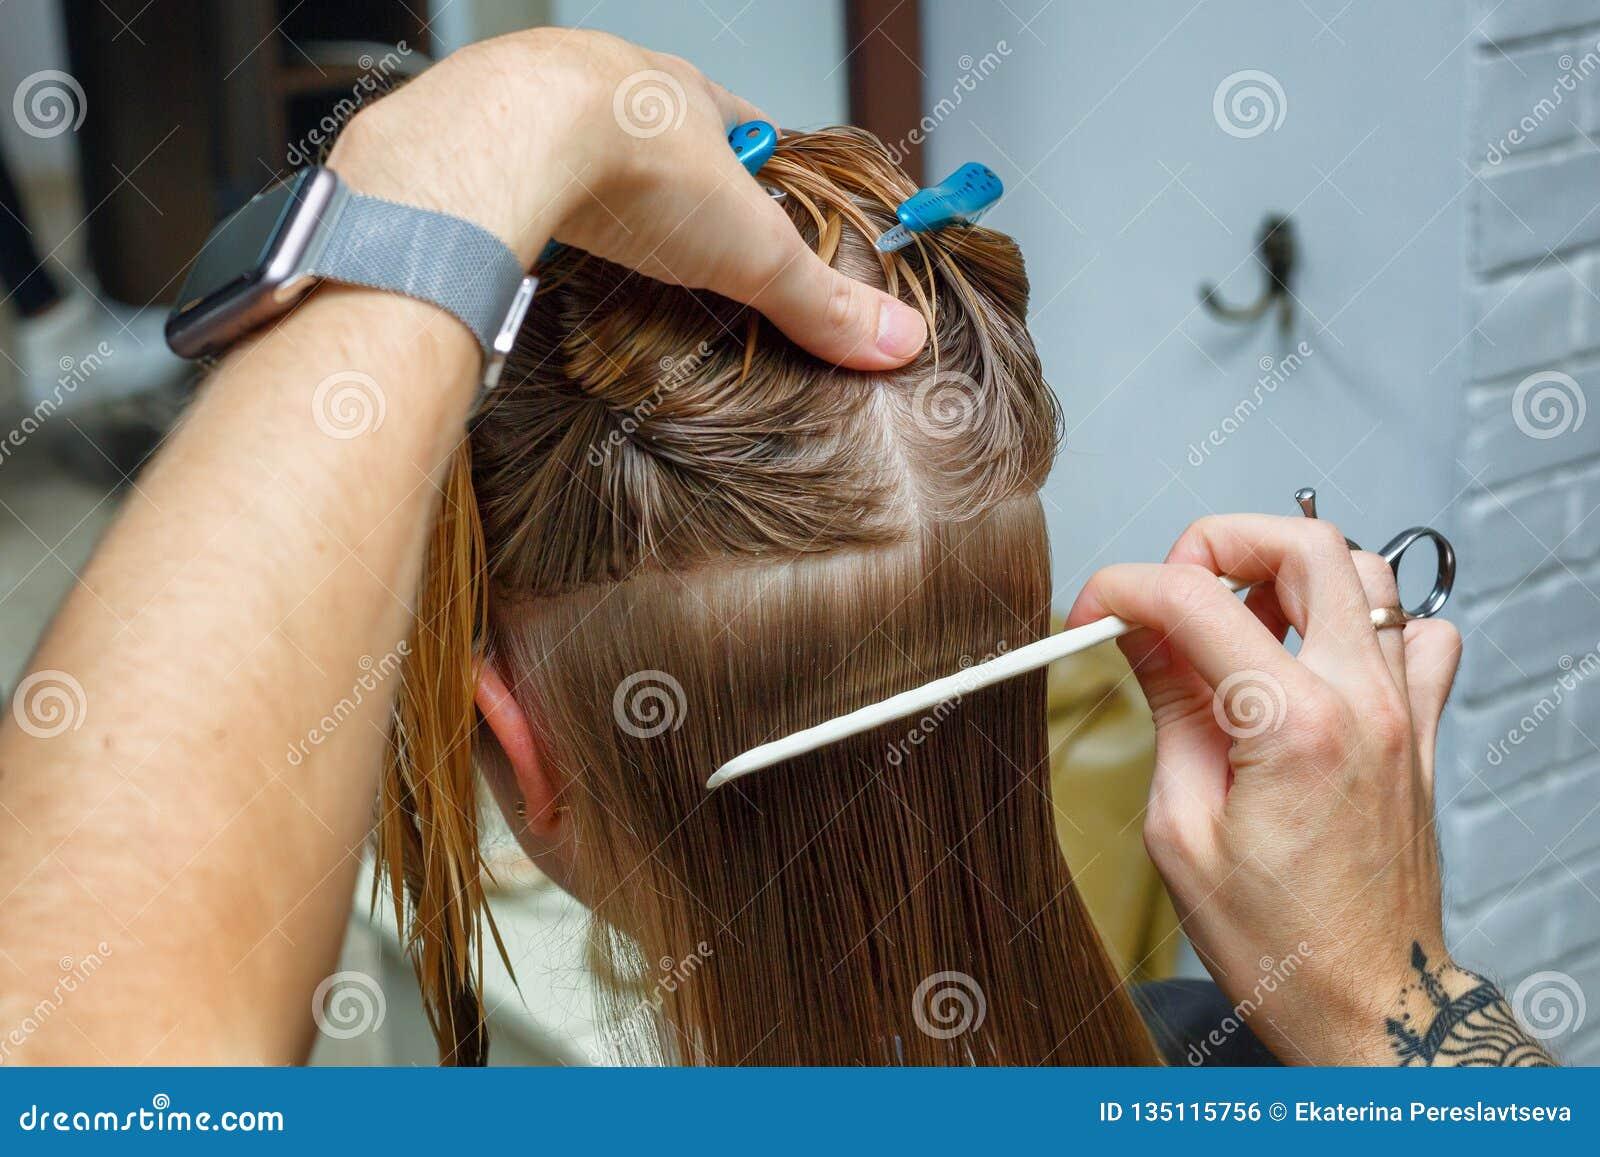 Hair cut in the hairdresser`s salon